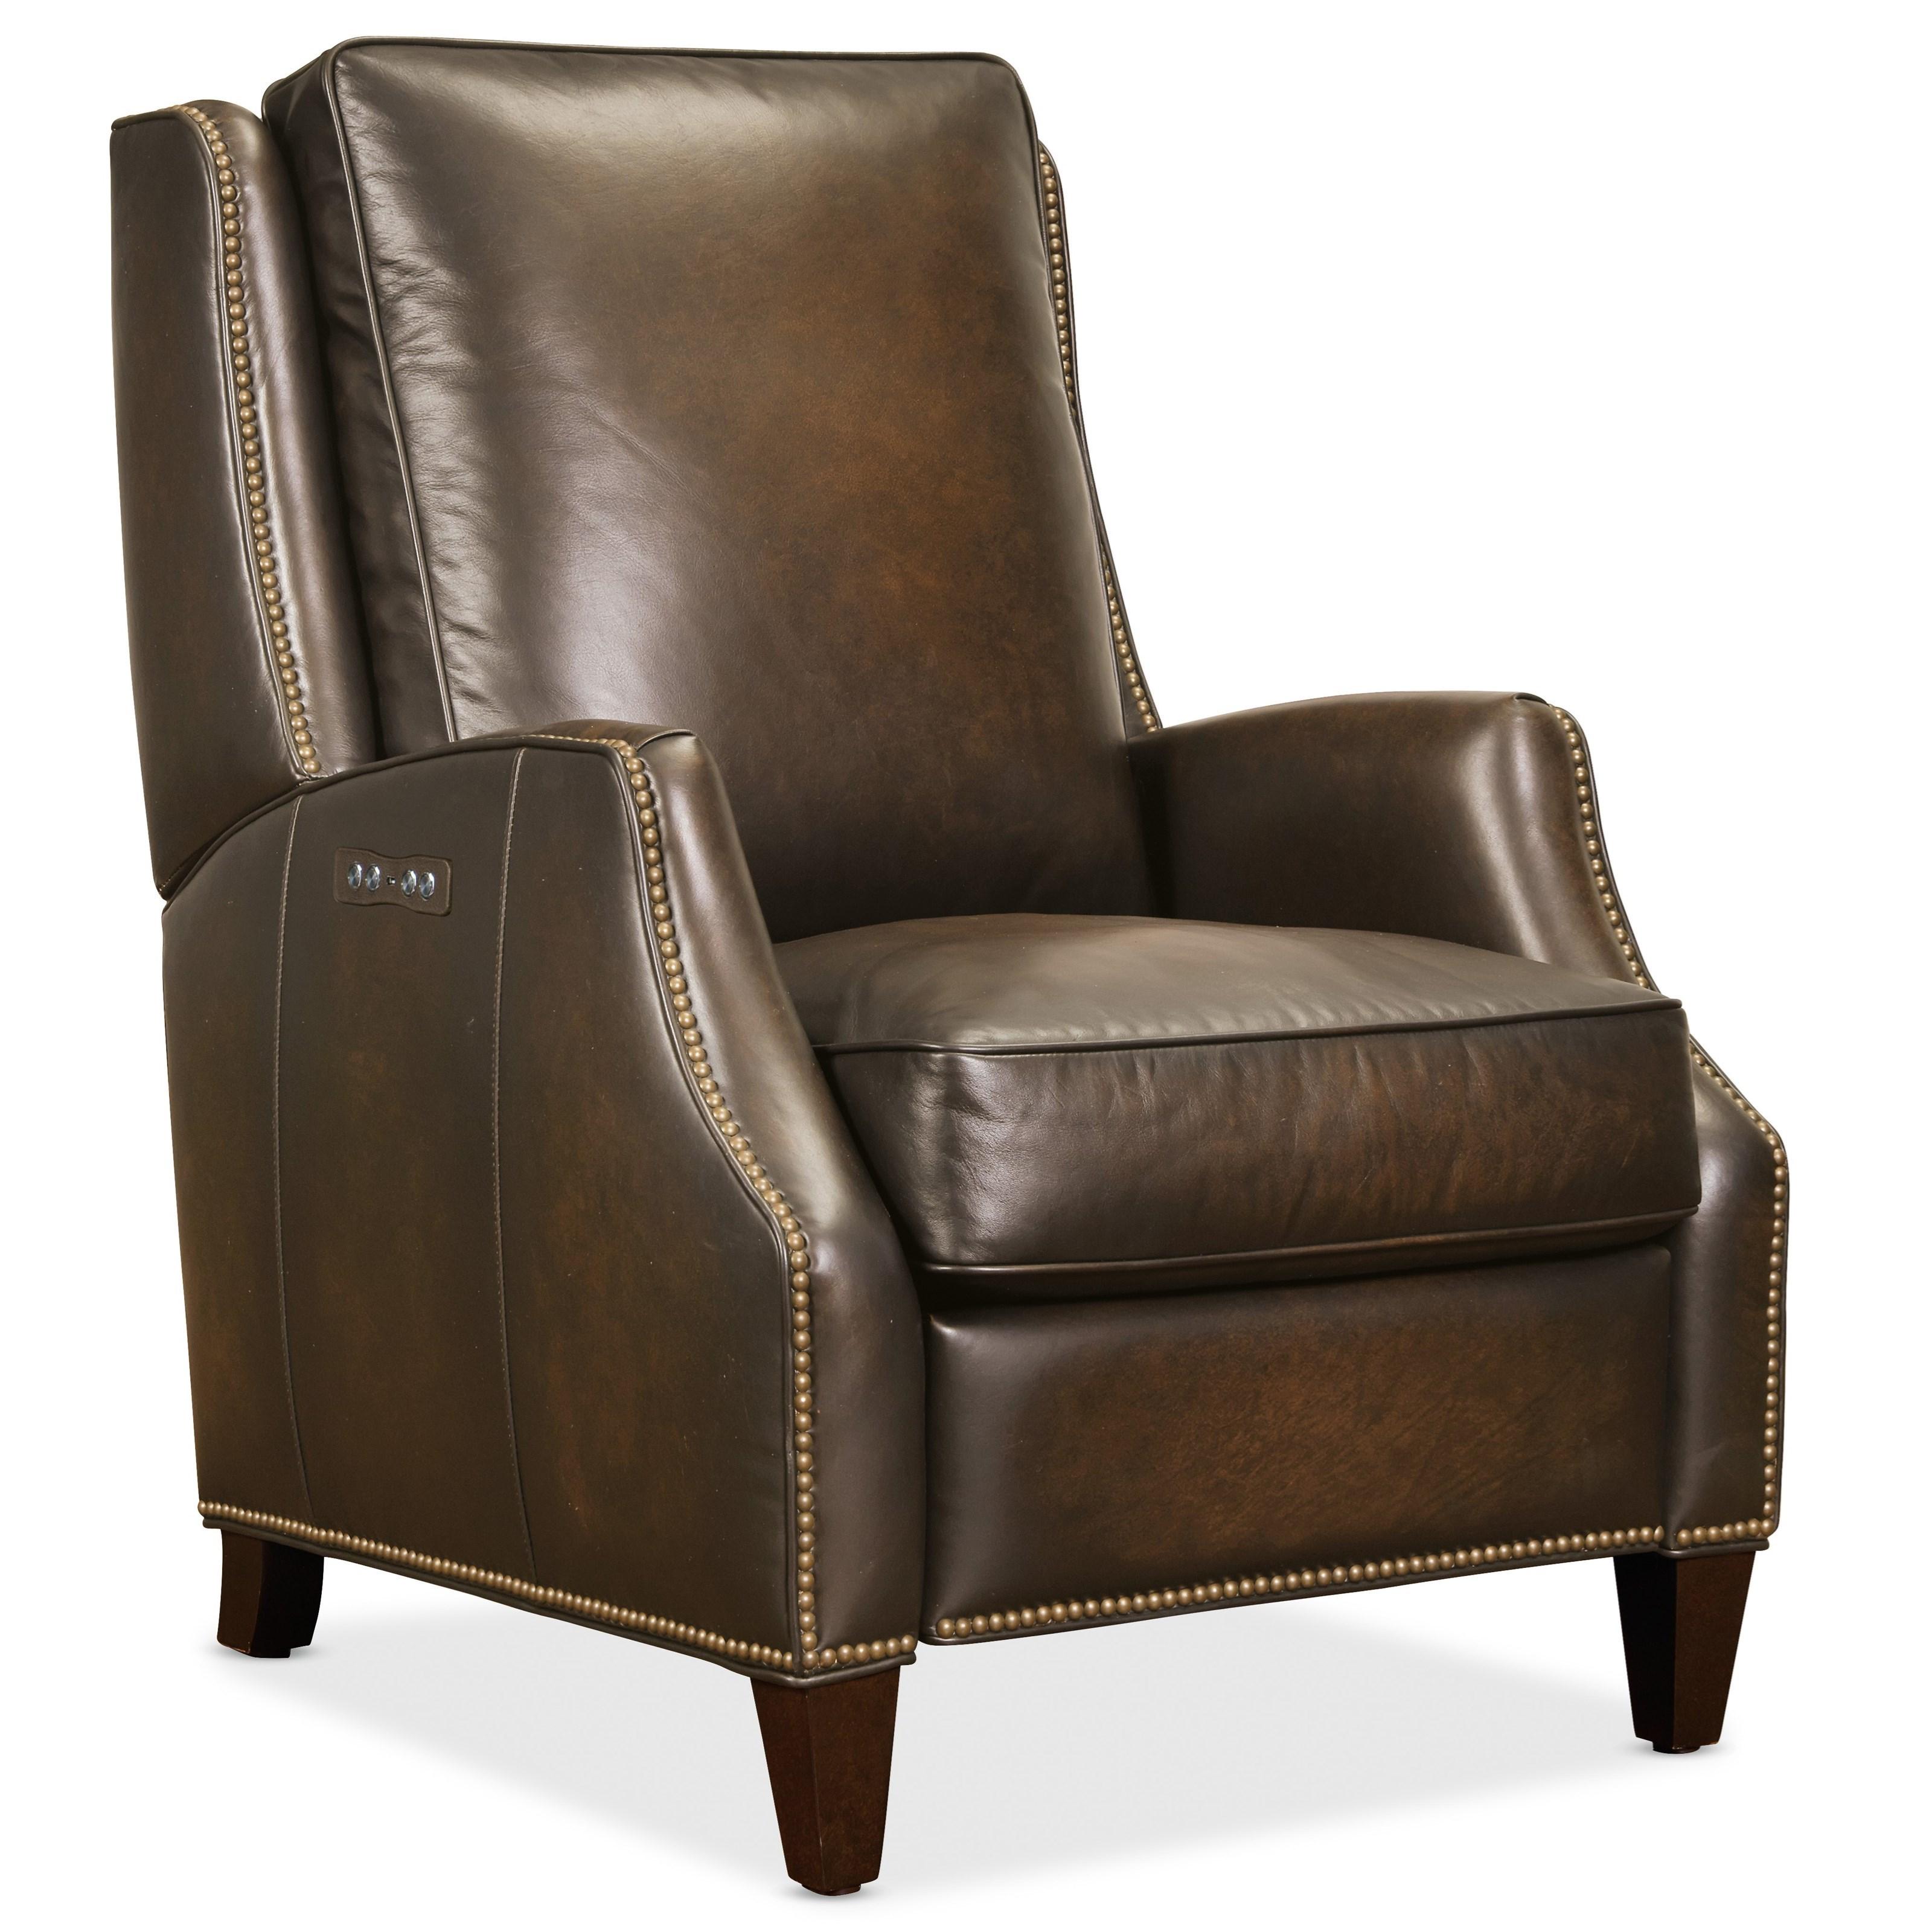 Kerley Power Recliner w/ Power Headrest by Hooker Furniture at Johnny Janosik